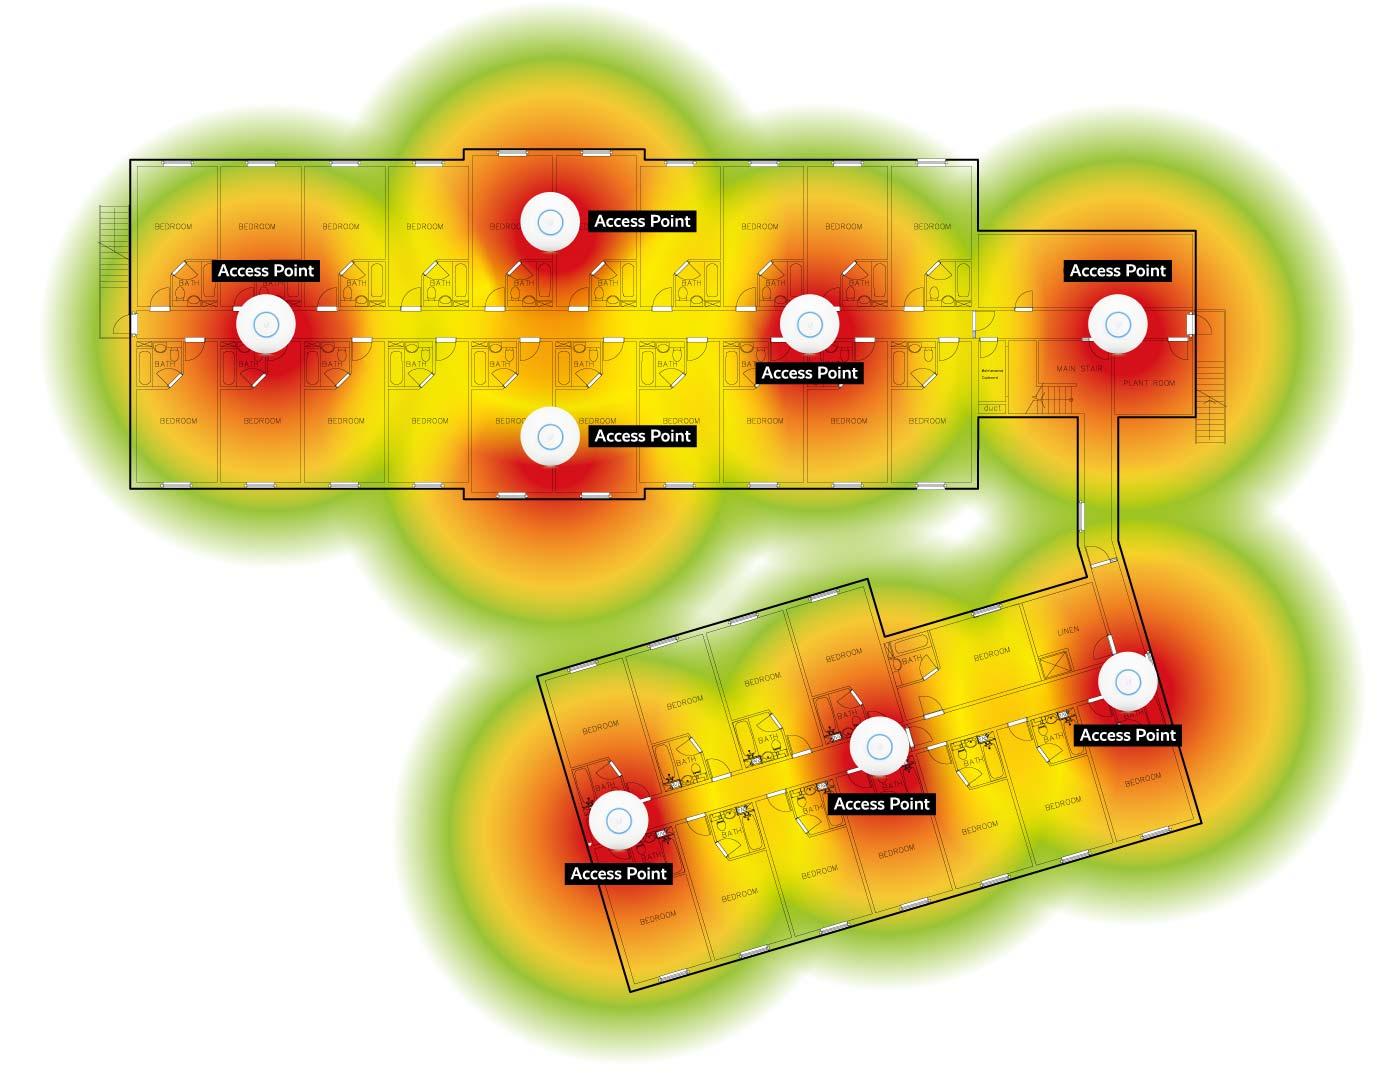 HotelWiFi Survey Heatmap